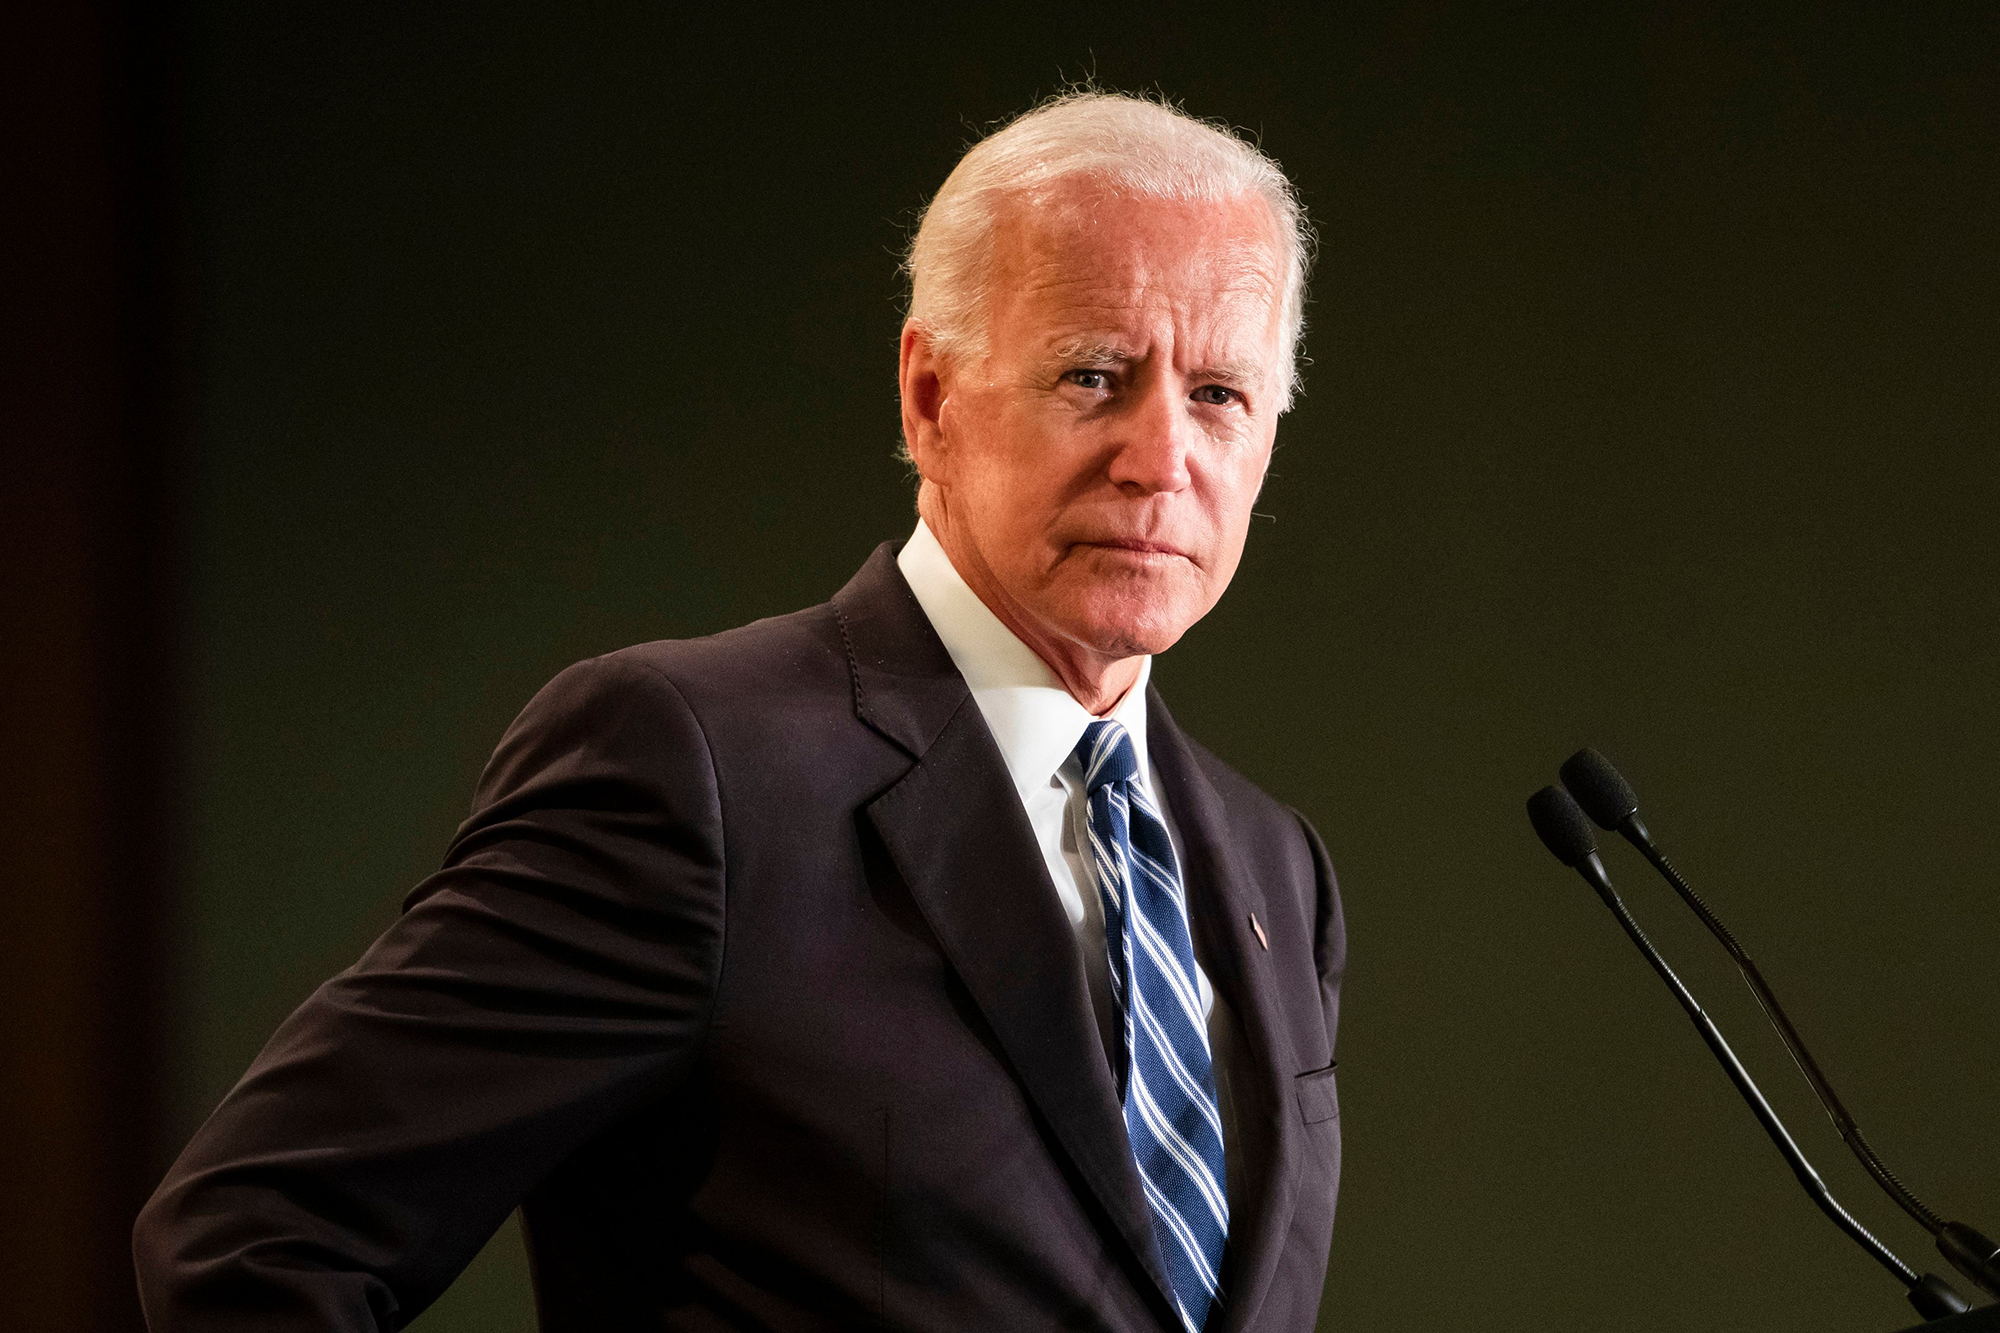 Biden Accidentally Says He's Running, Crowd Chants 'Run, Joe, Run!'